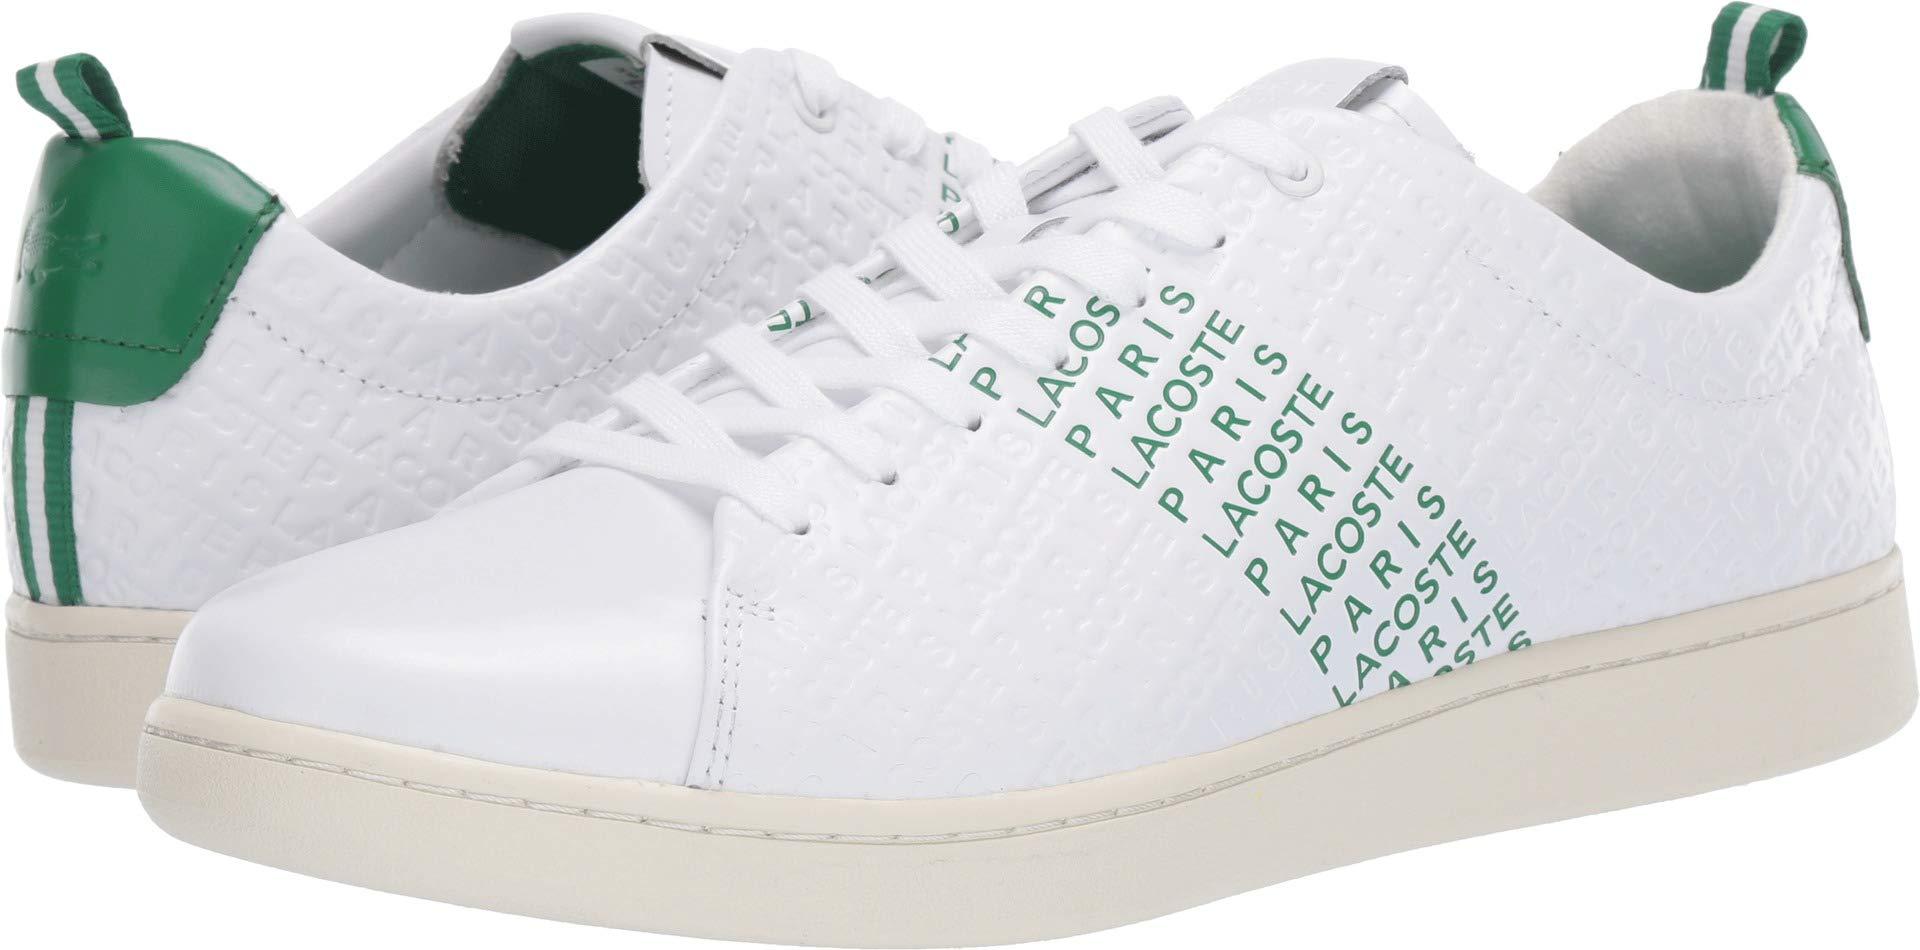 ae33f827 Lacoste Men's CARNABY EVO Sneaker, White/Green, 9 Medium US